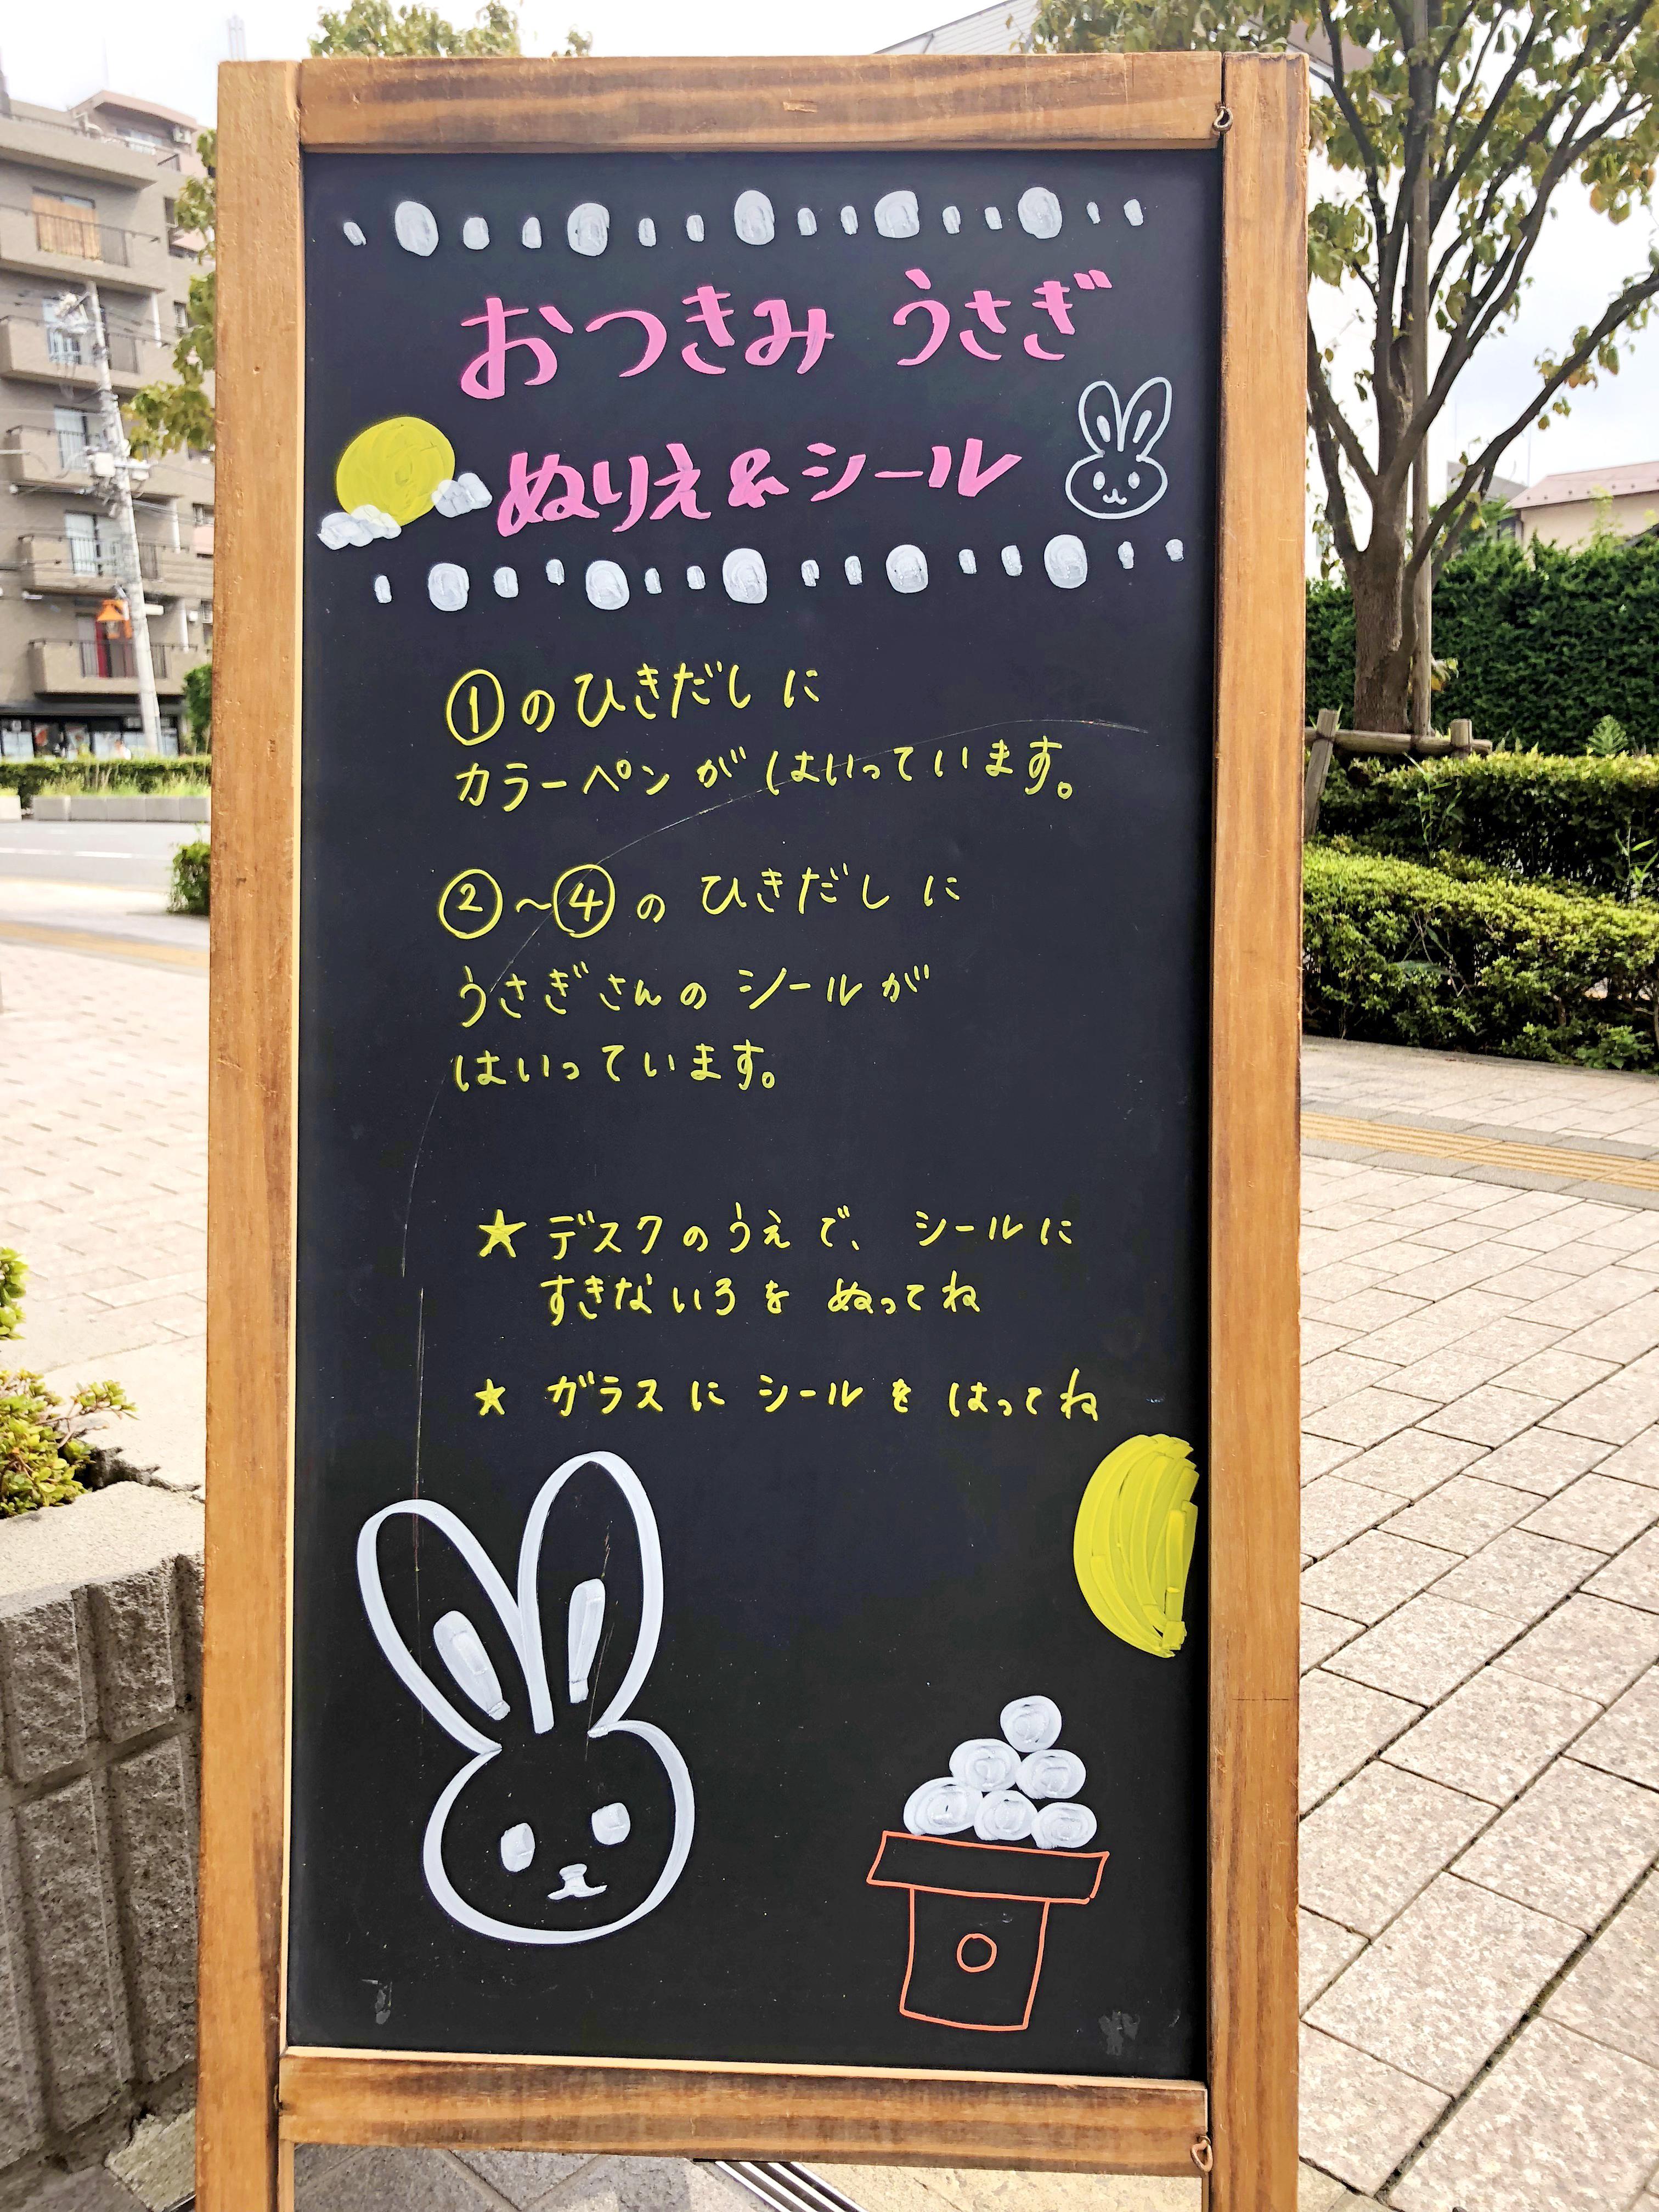 2018-09-01_otsukimi-mitaka-2blboad